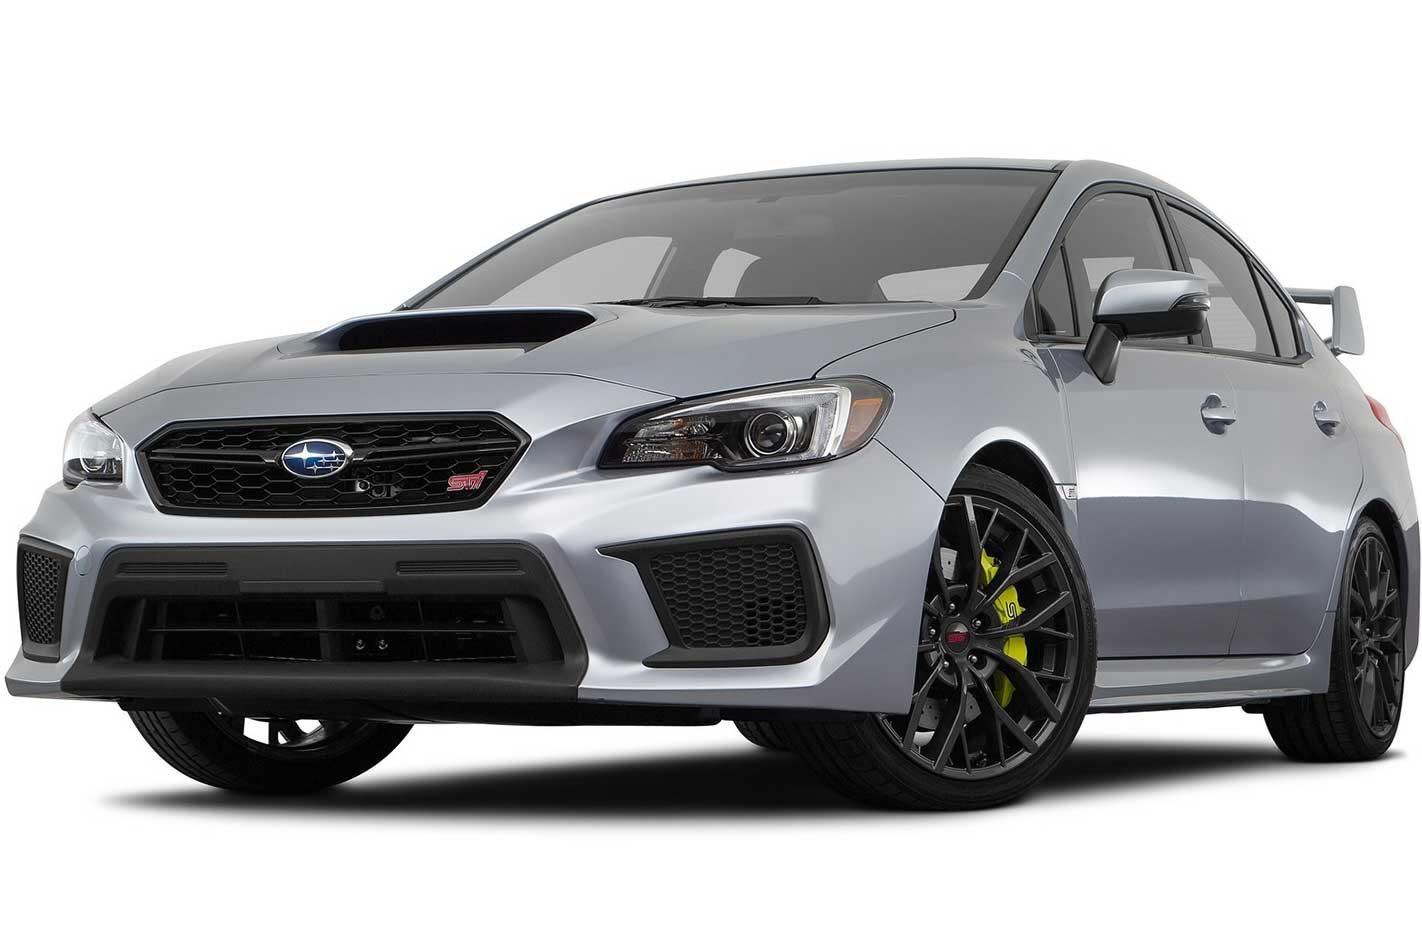 Subaru WRX STI Spec R 2020 review